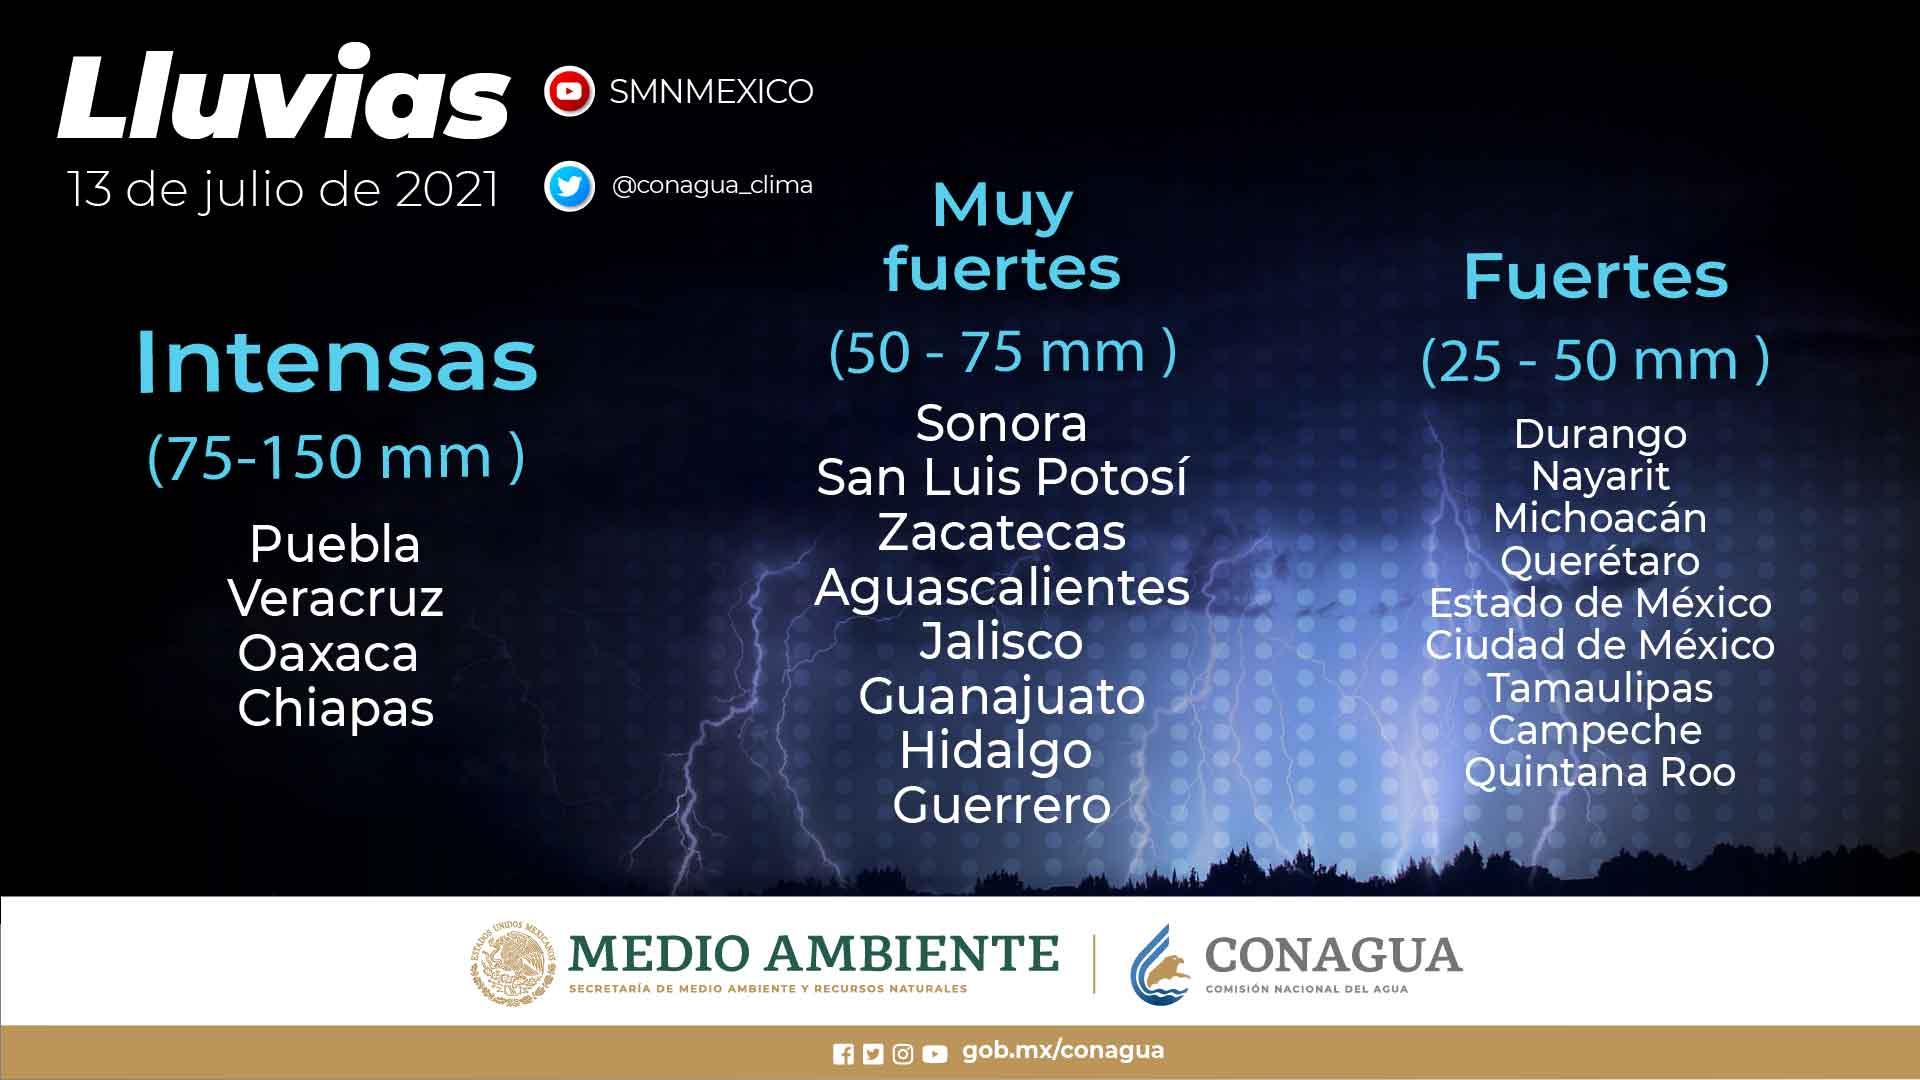 Probabilidad de chubascos para Tlaxcala el dia de hoy martes